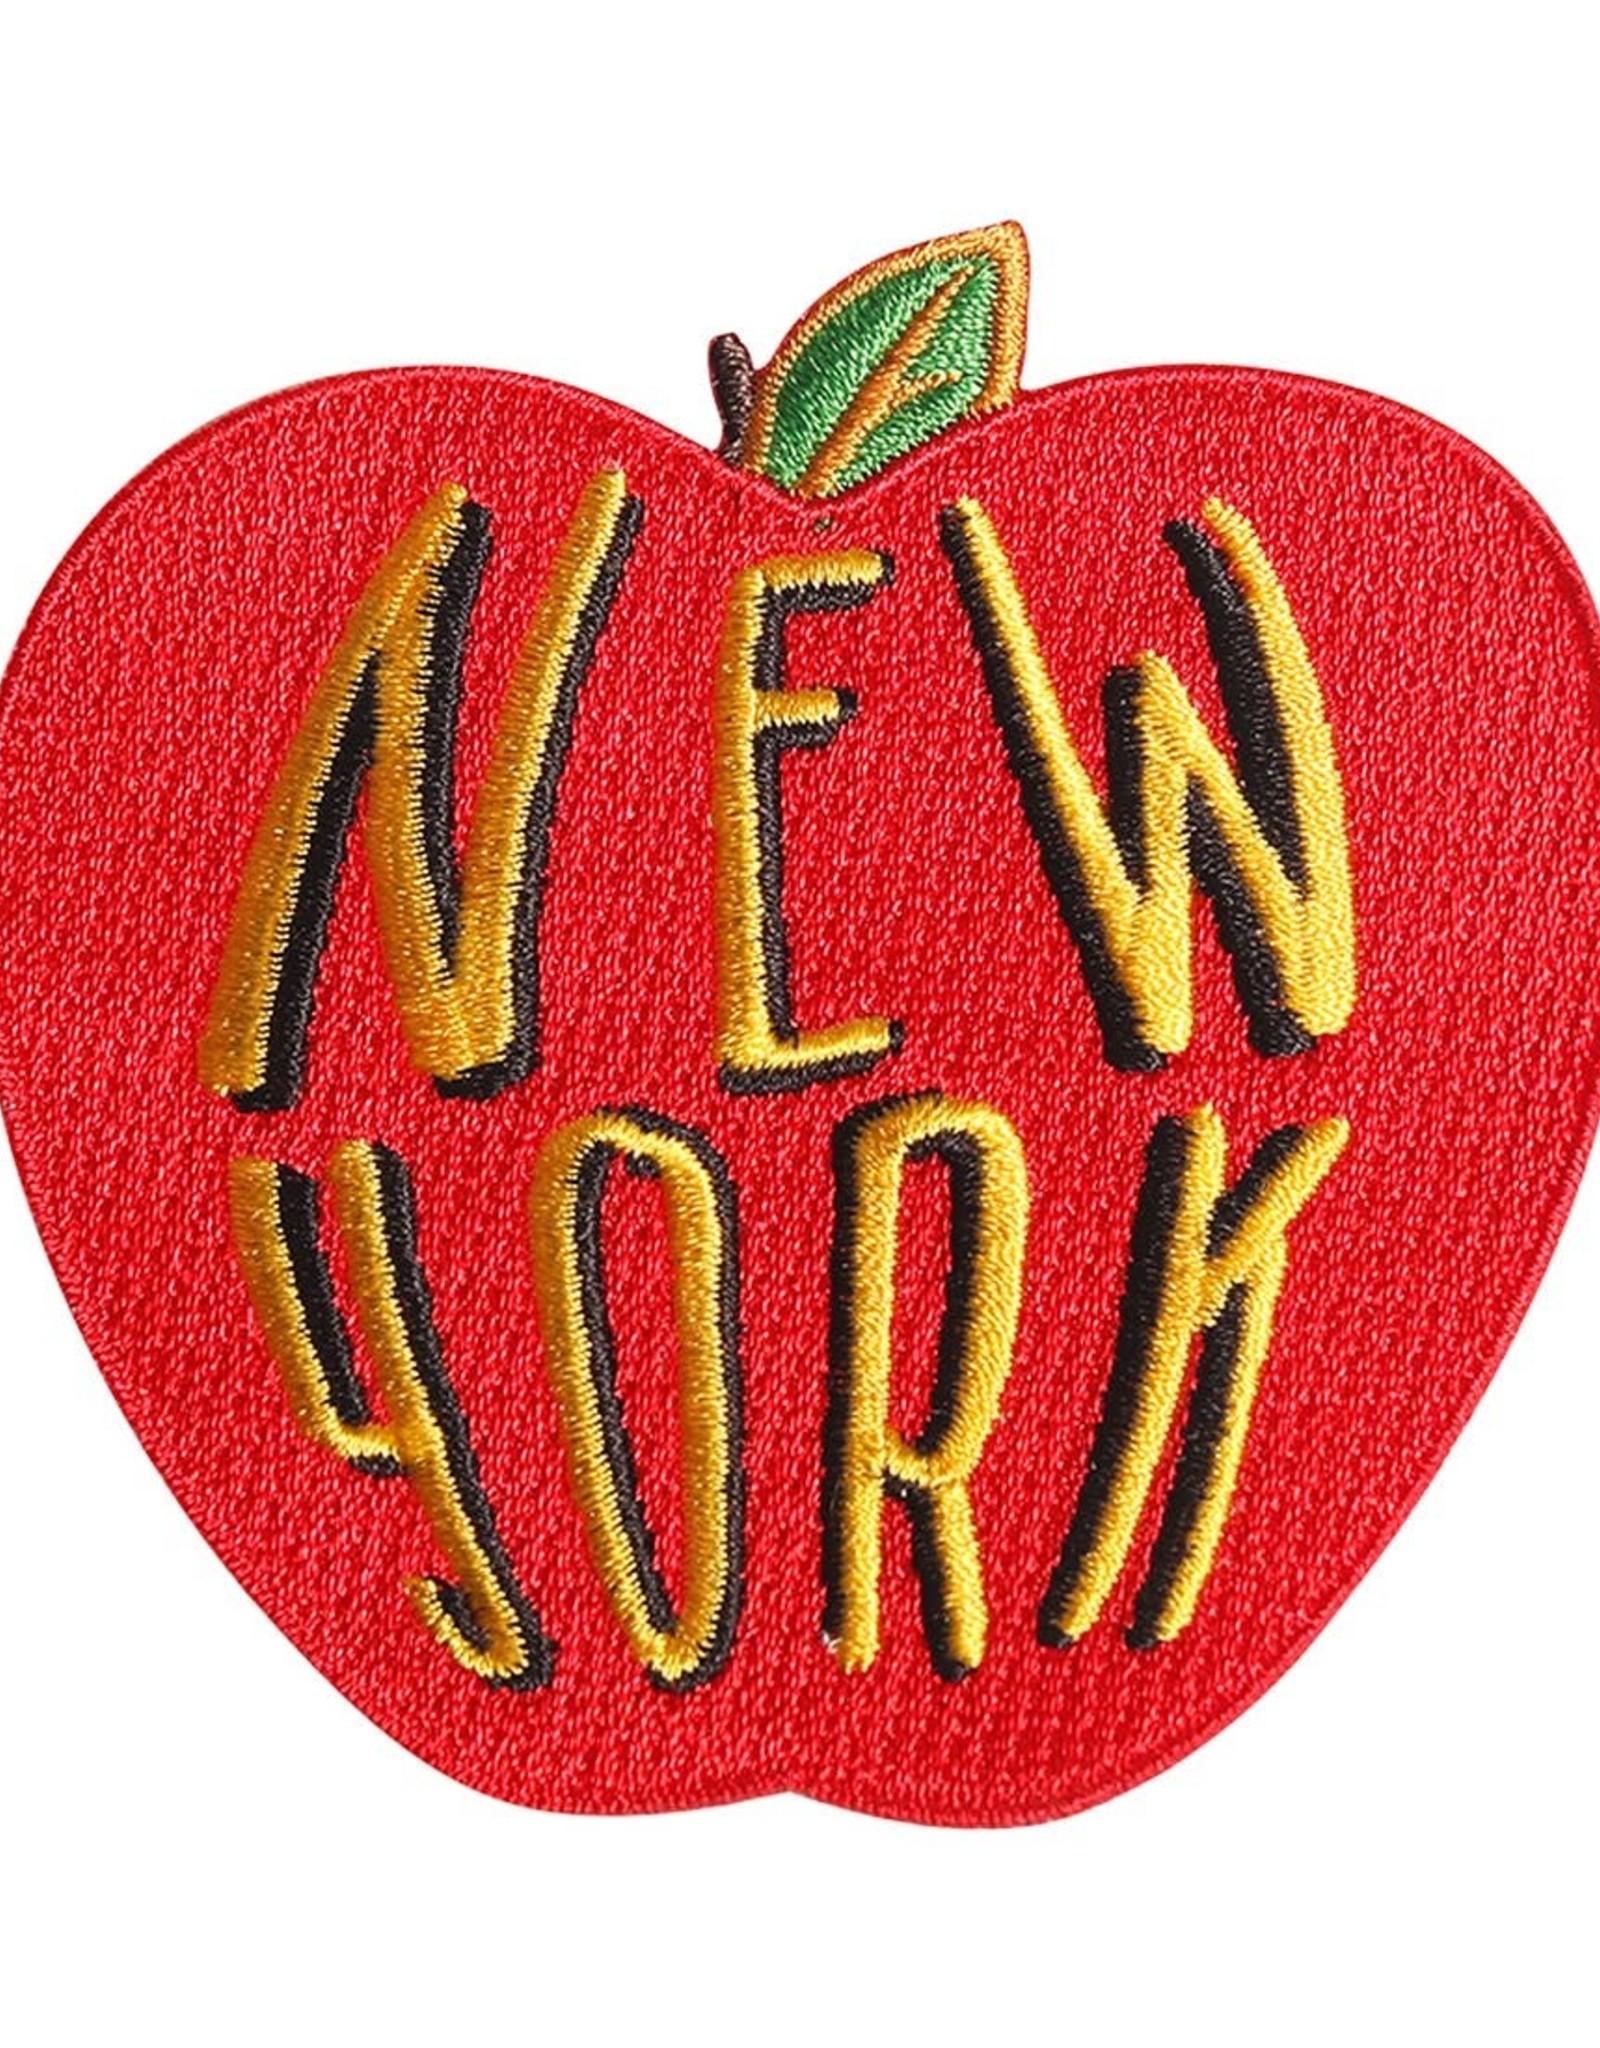 Patch: New York Apple